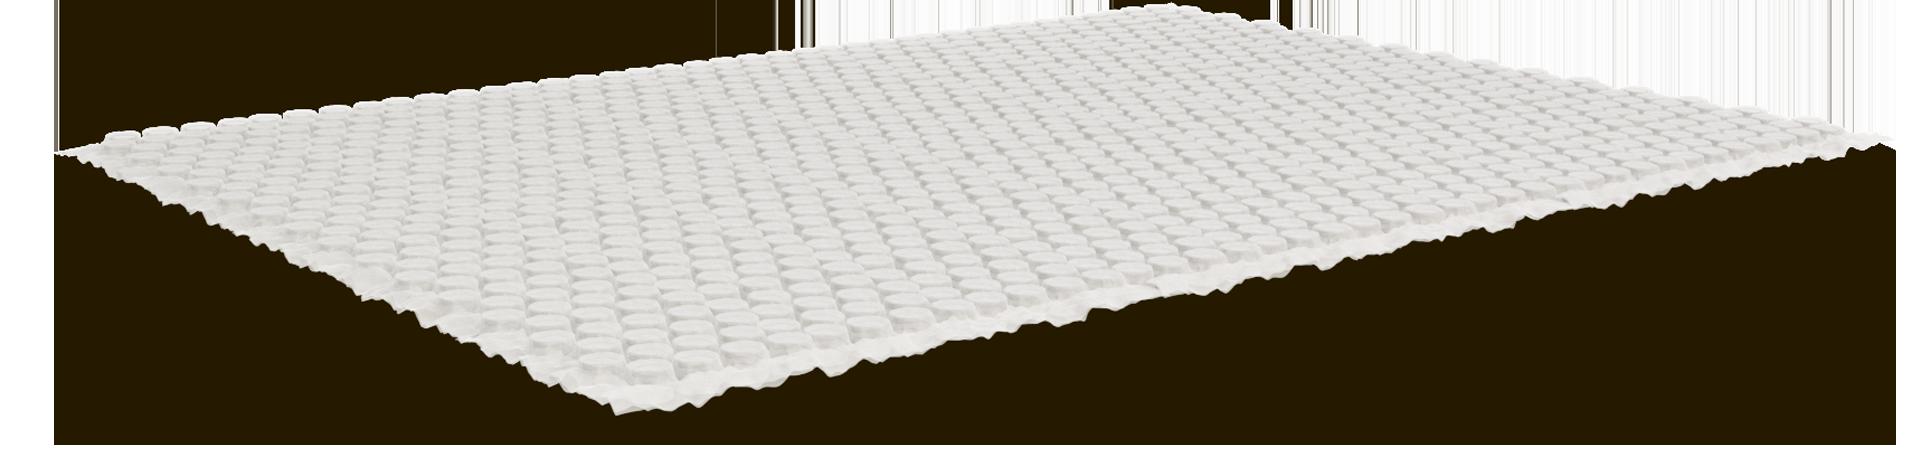 Mattress Layer 4 - Micro-Coils